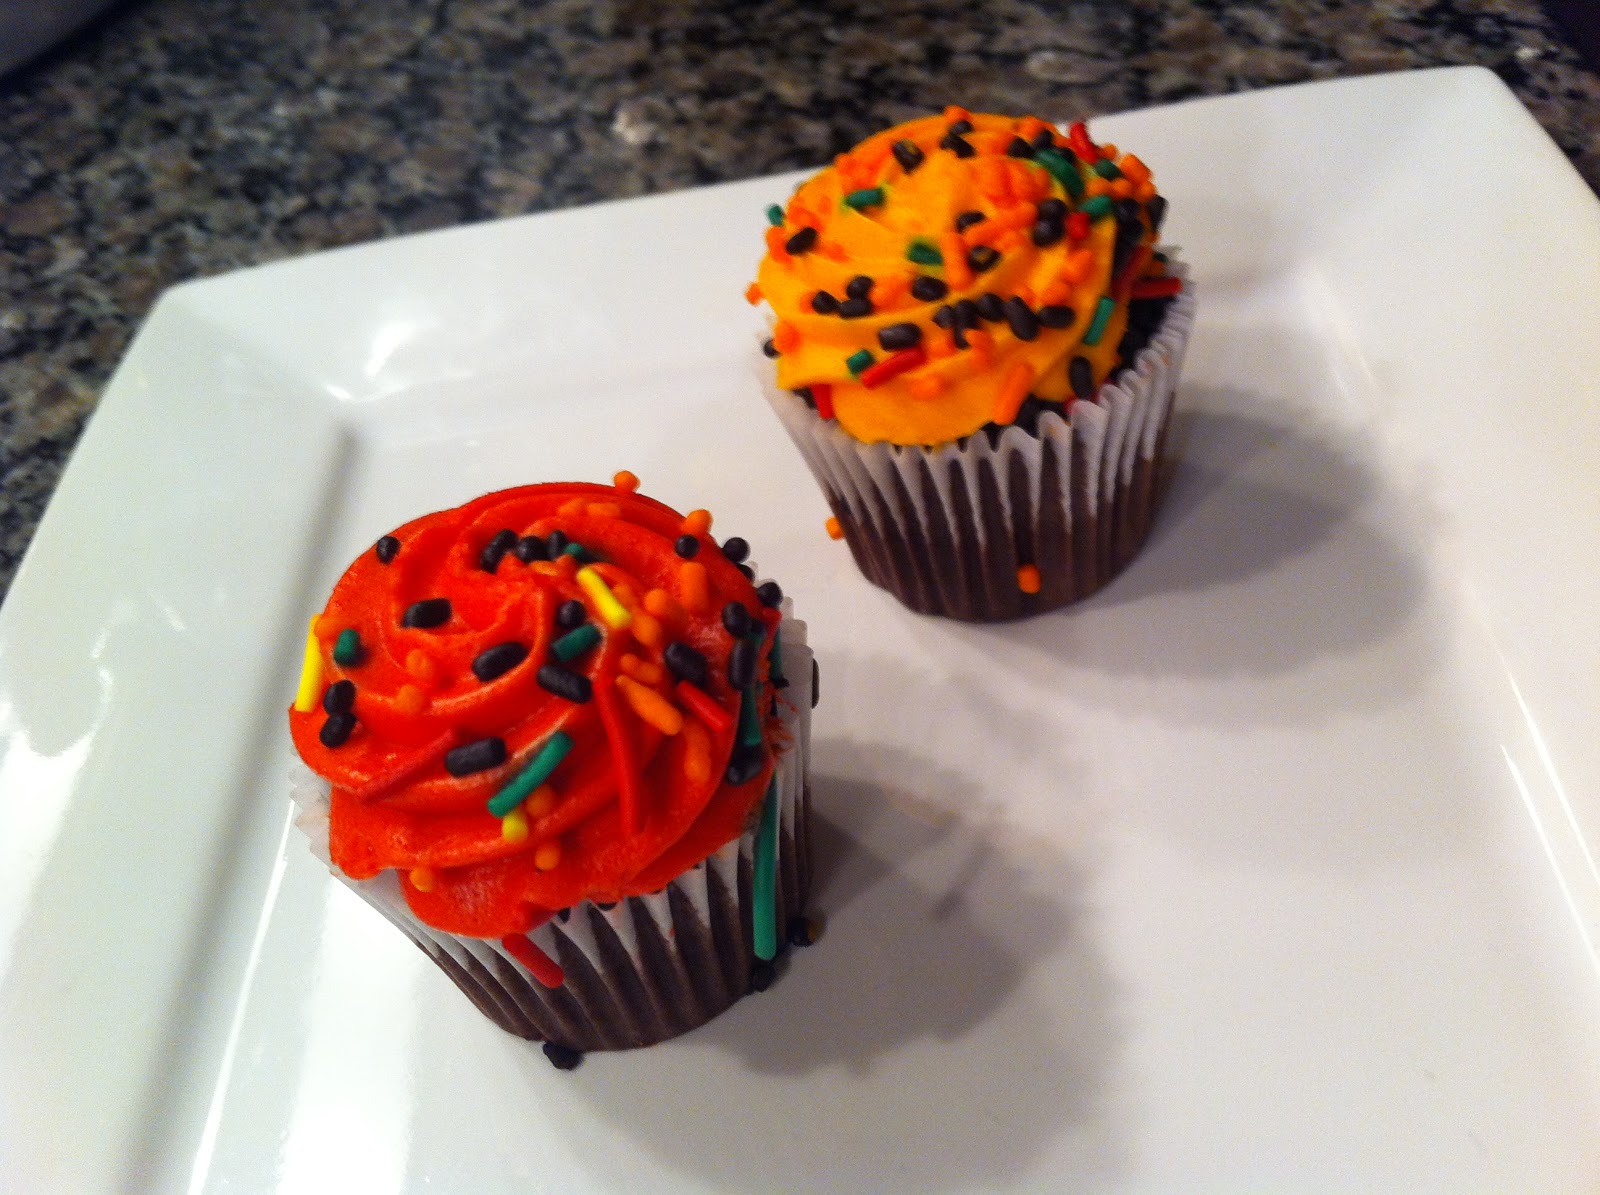 acme cupcakes